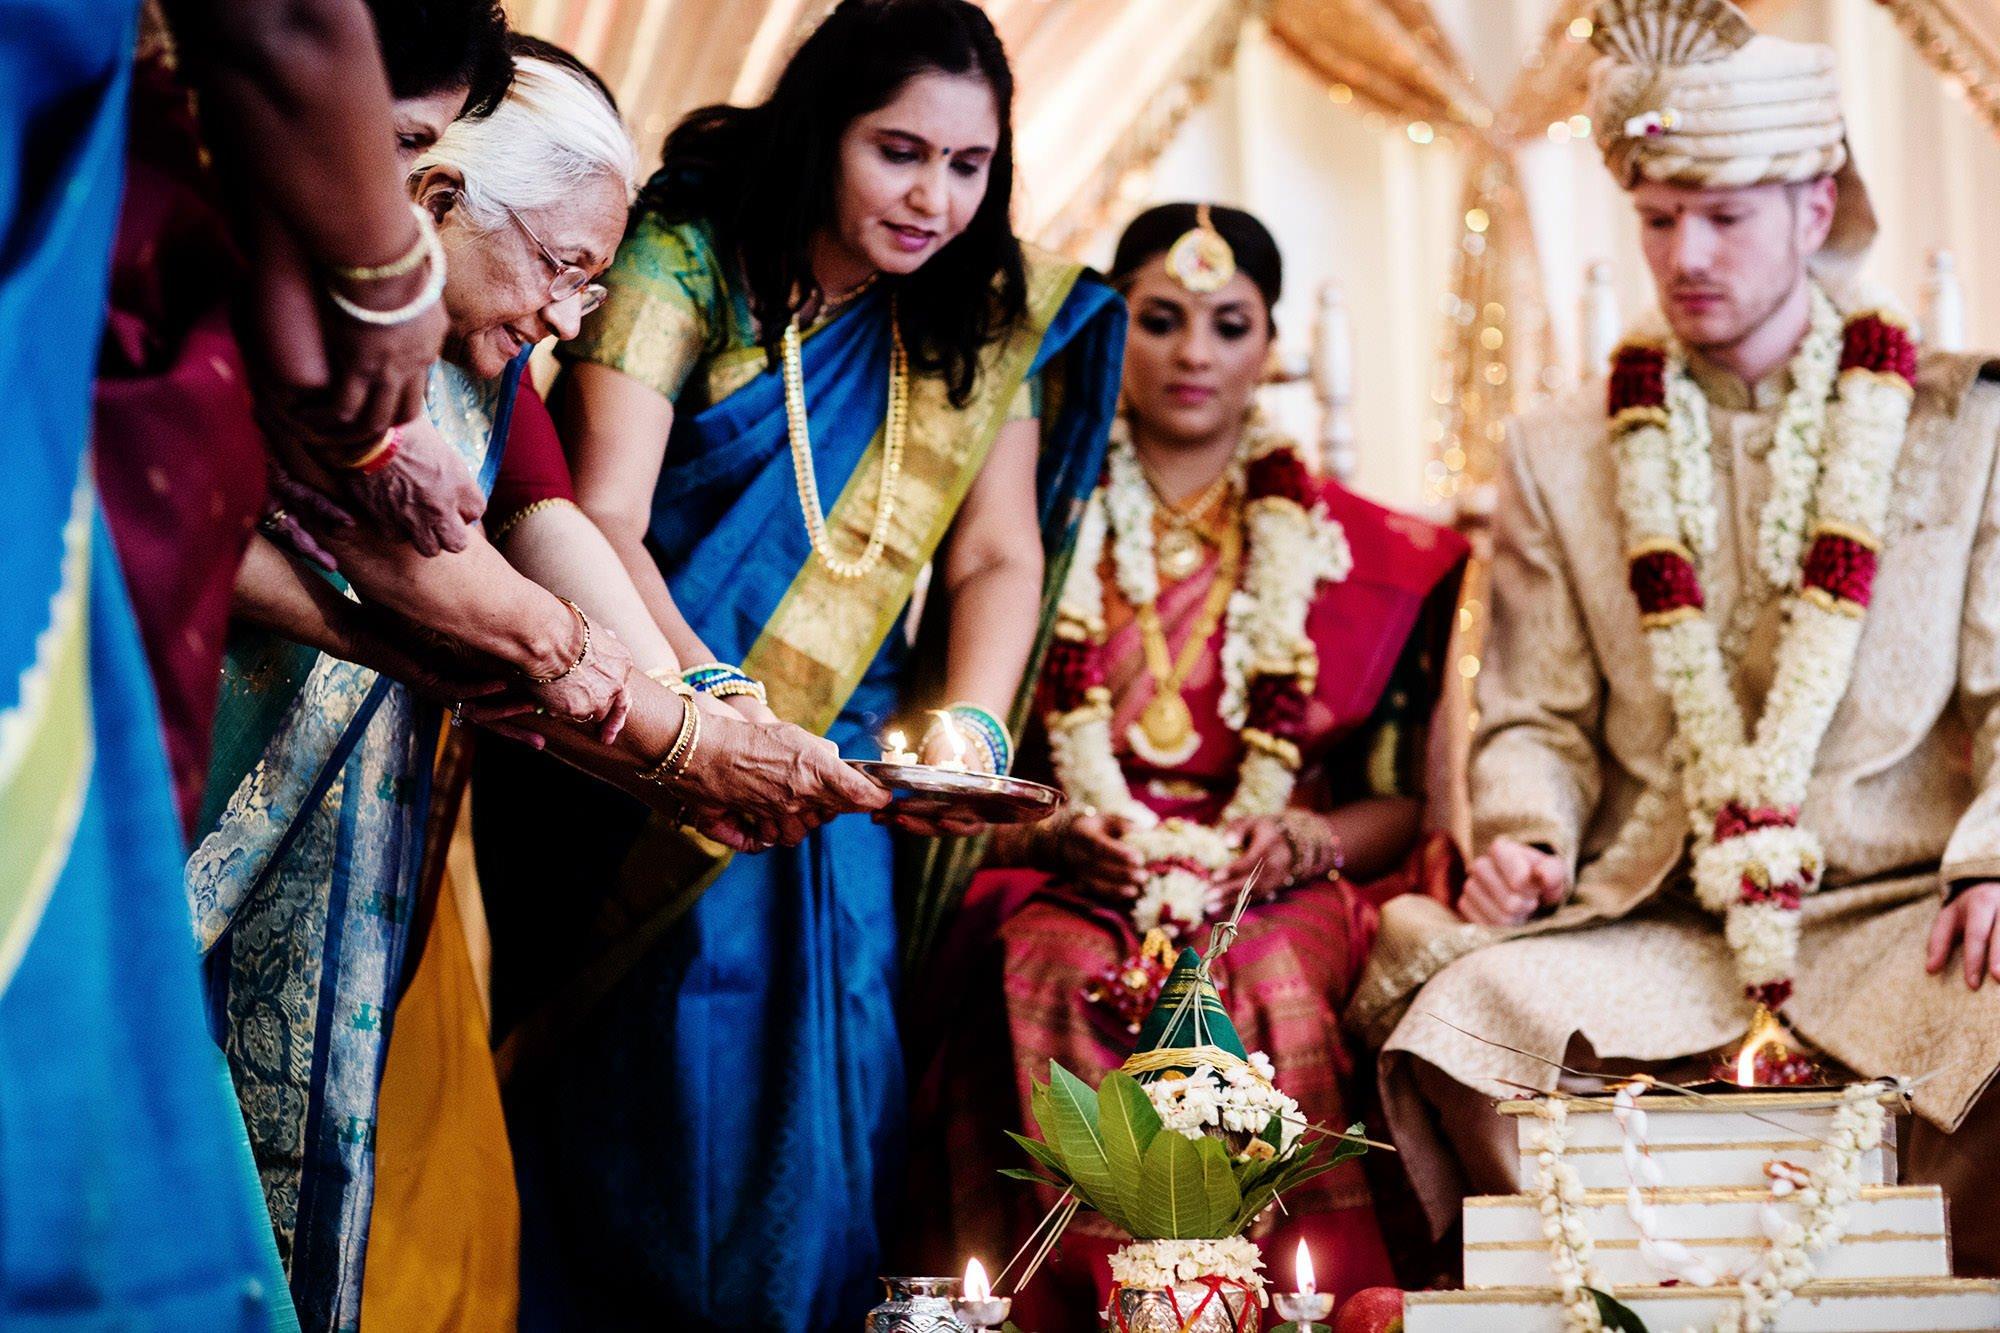 Foxchase Manor Wedding in Manassas, VA  I  Bride and Groom, Hindu Ceremony, Indian Wedding